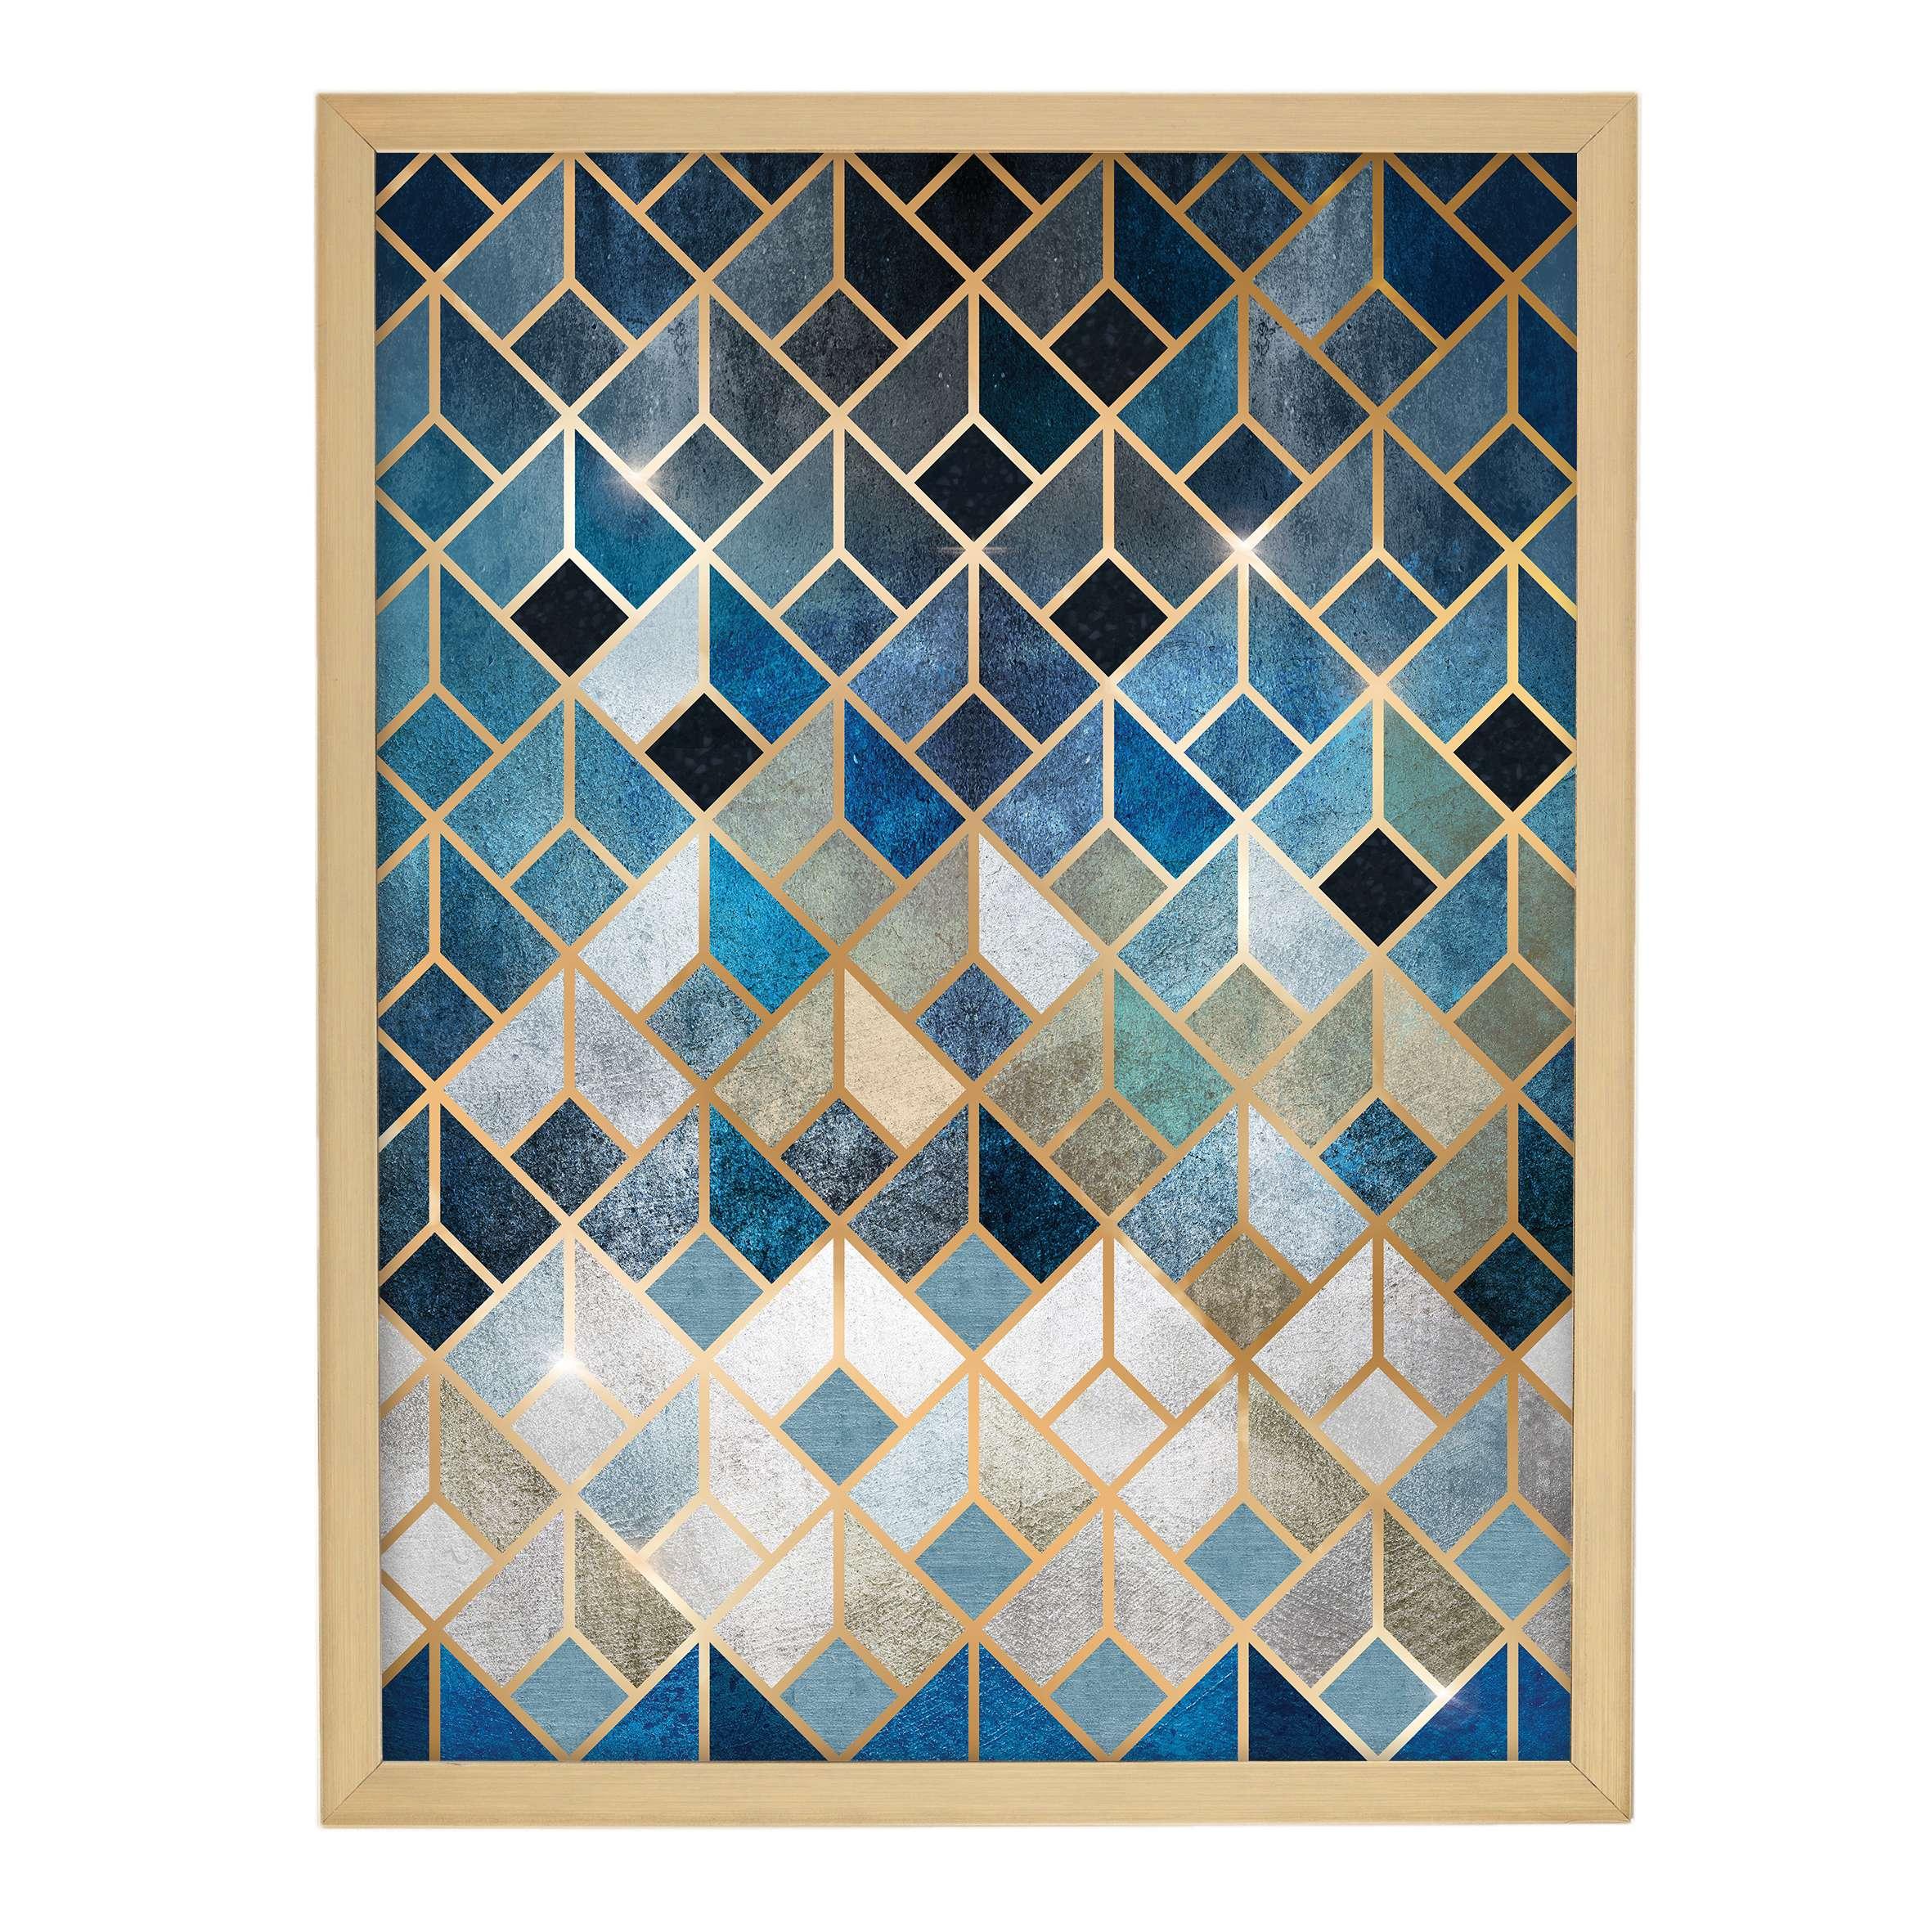 Wandbild Geometric 30x40cm gold&navy, 30 × 40 cm | Dekoration > Bilder und Rahmen > Bilder | Dekoria